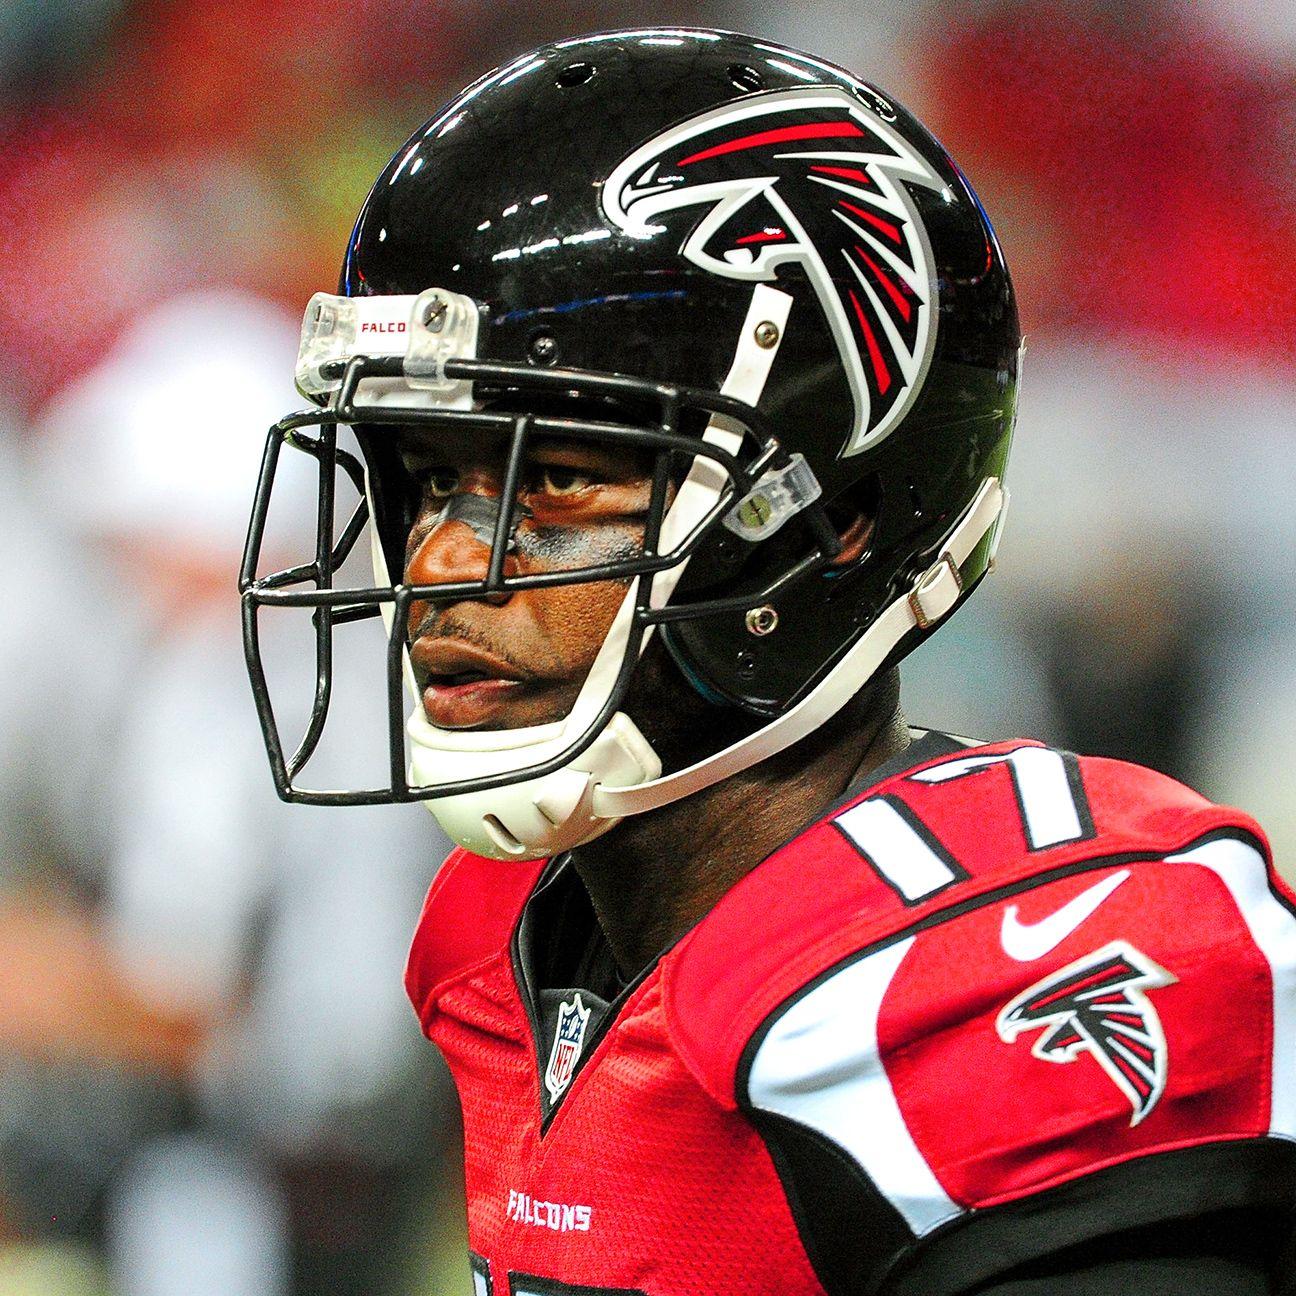 Nike jerseys for Cheap - Football - Atlanta Falcons news - NewsLocker